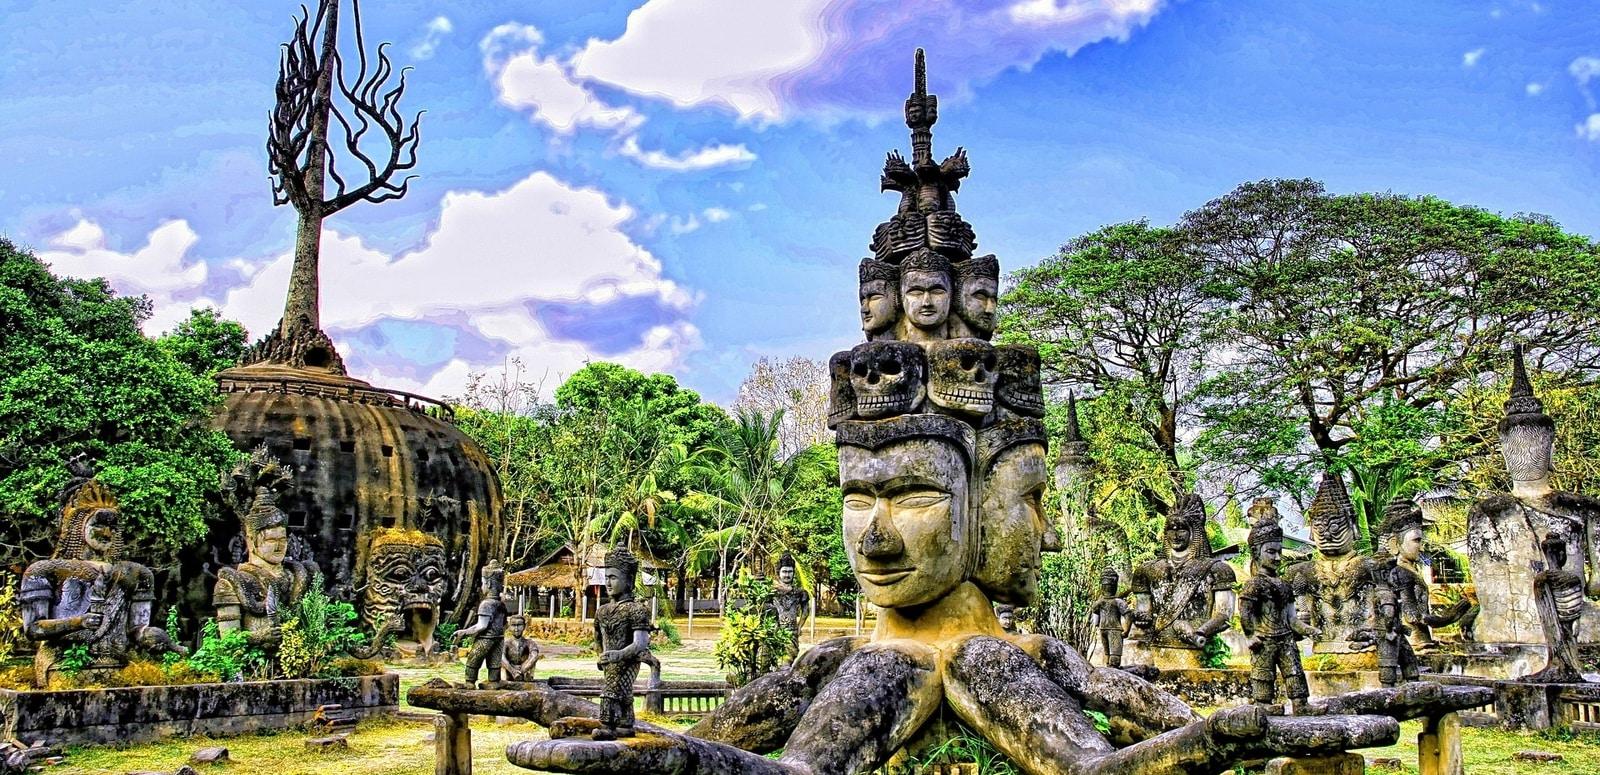 1464188669_civilization_maya_vientiane_laos_statue_25388_1920x1080.jpg